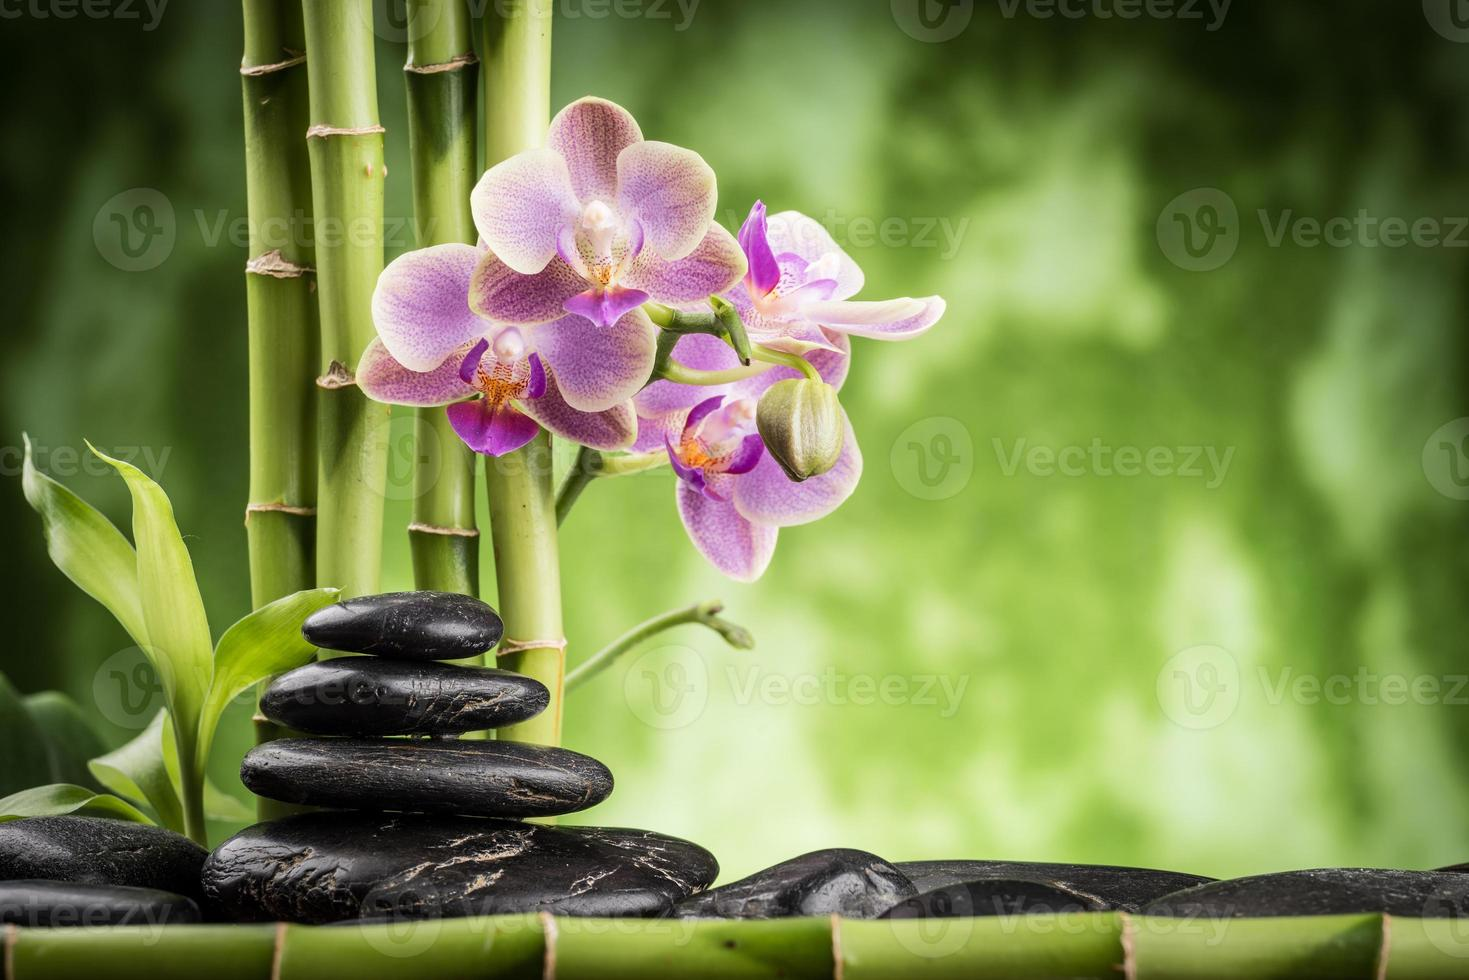 Zen-like photo